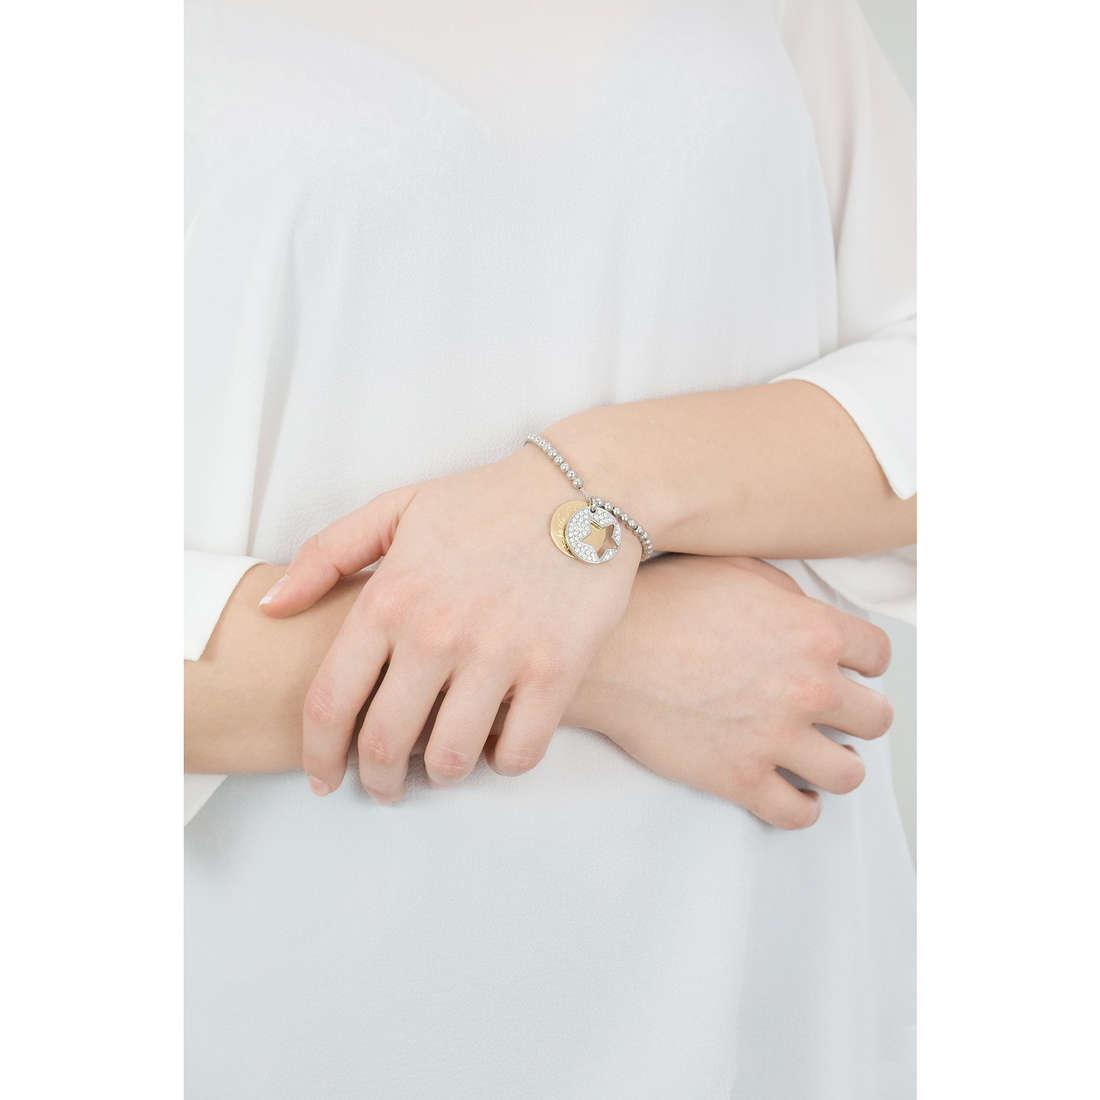 Sagapò bracciali Fortune donna SFO17 indosso